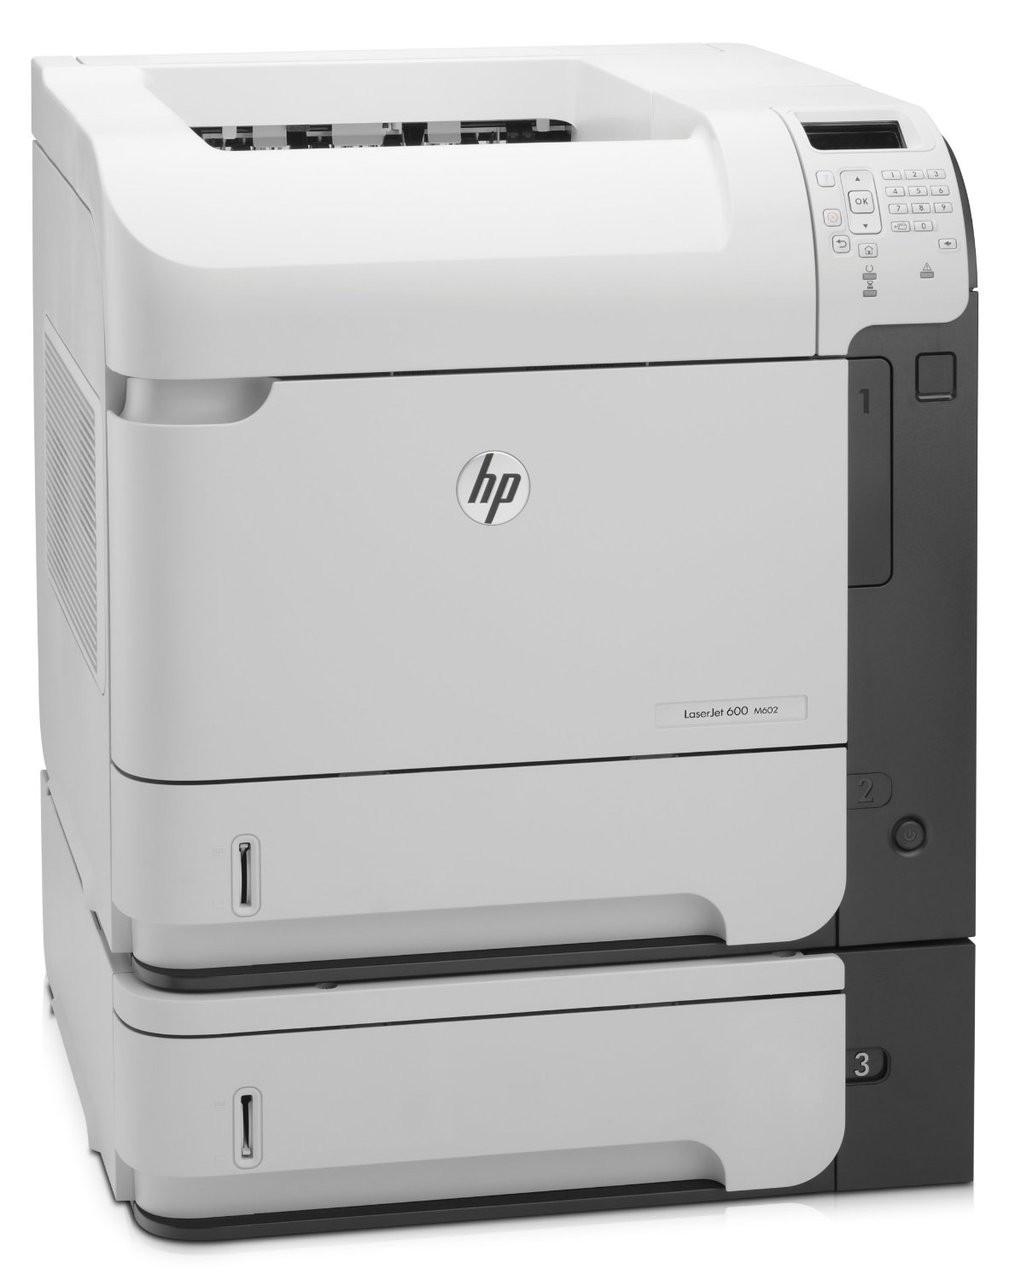 HP LaserJet Enterprise 600 M602X - CE993A#BGJ - HP Laser Printer for sale